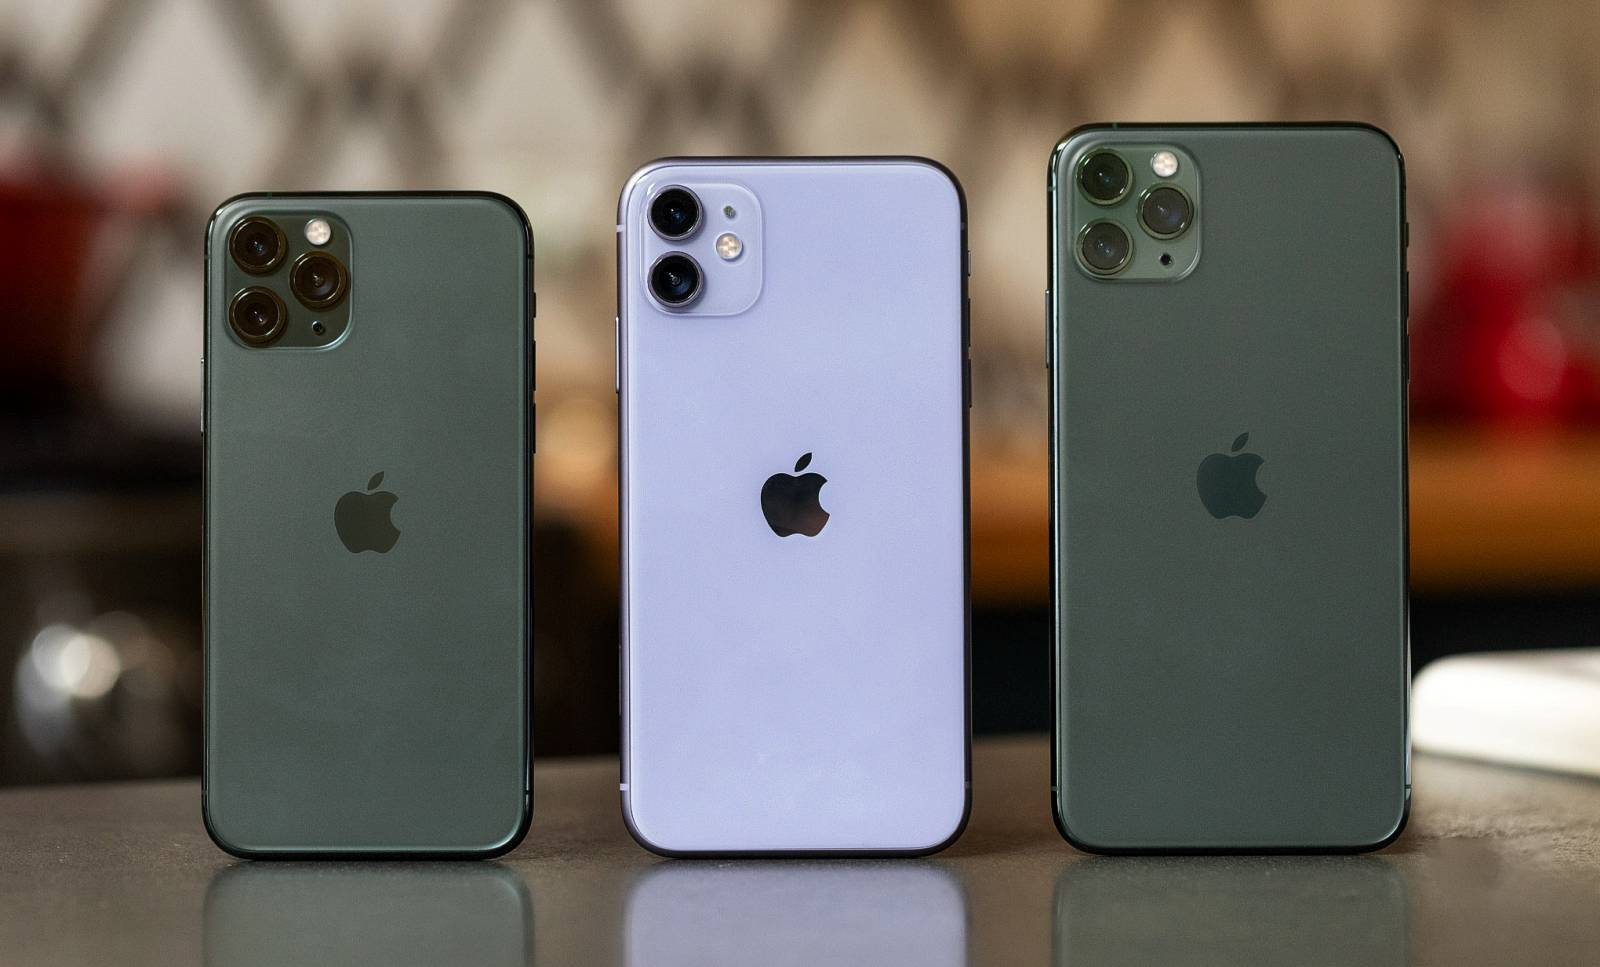 apple probleme huawei iphone 11